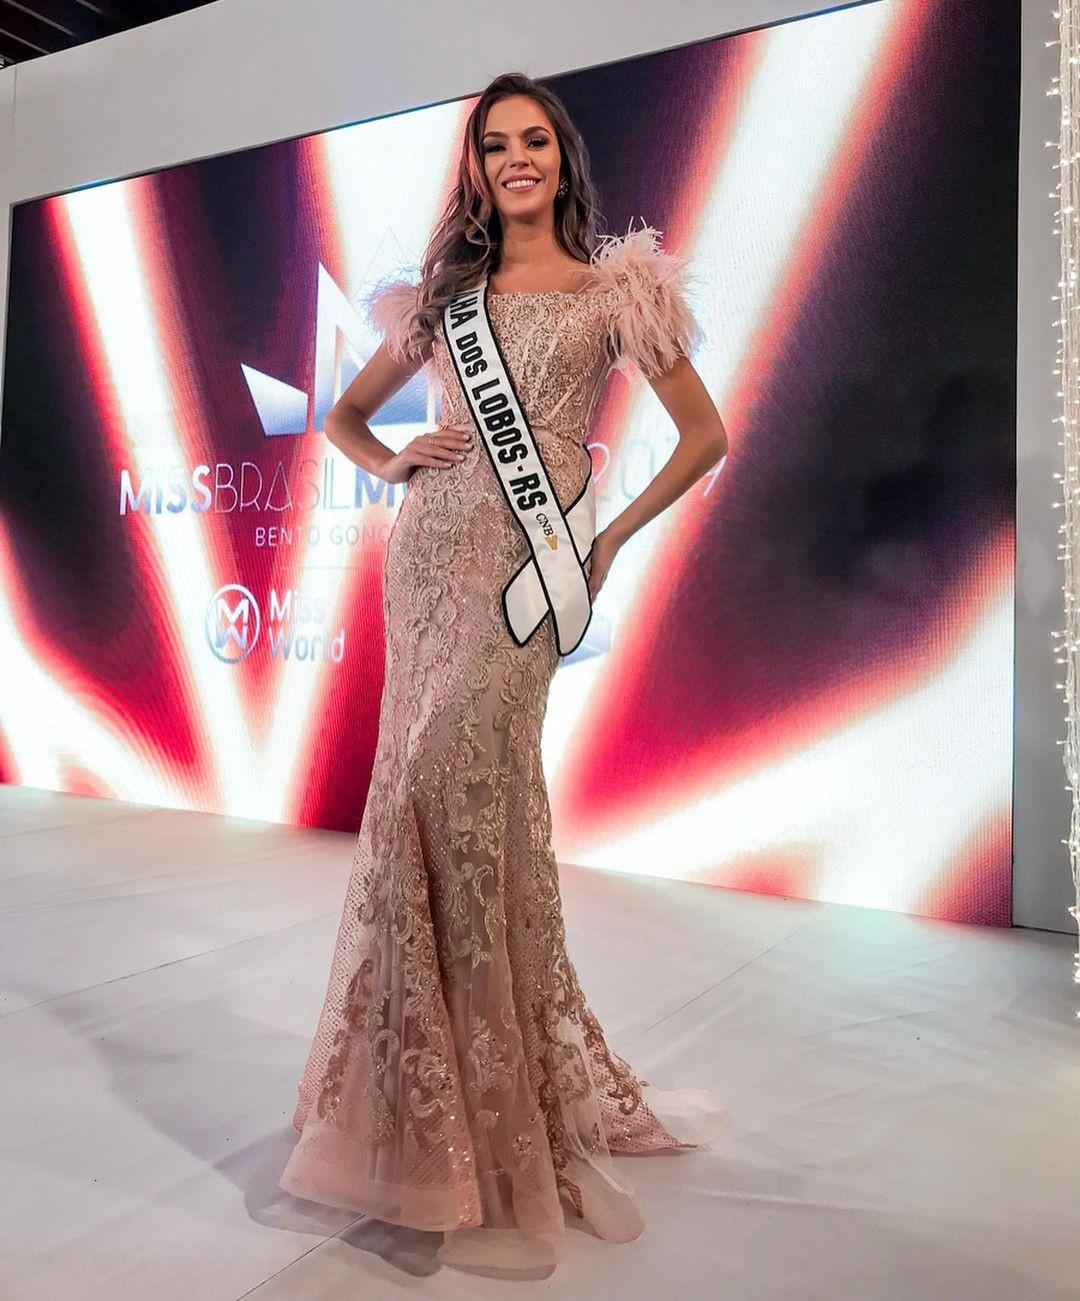 ana flavia giacomini, miss ilha dos lobos mundo 2019. - Página 9 Fwwjox10